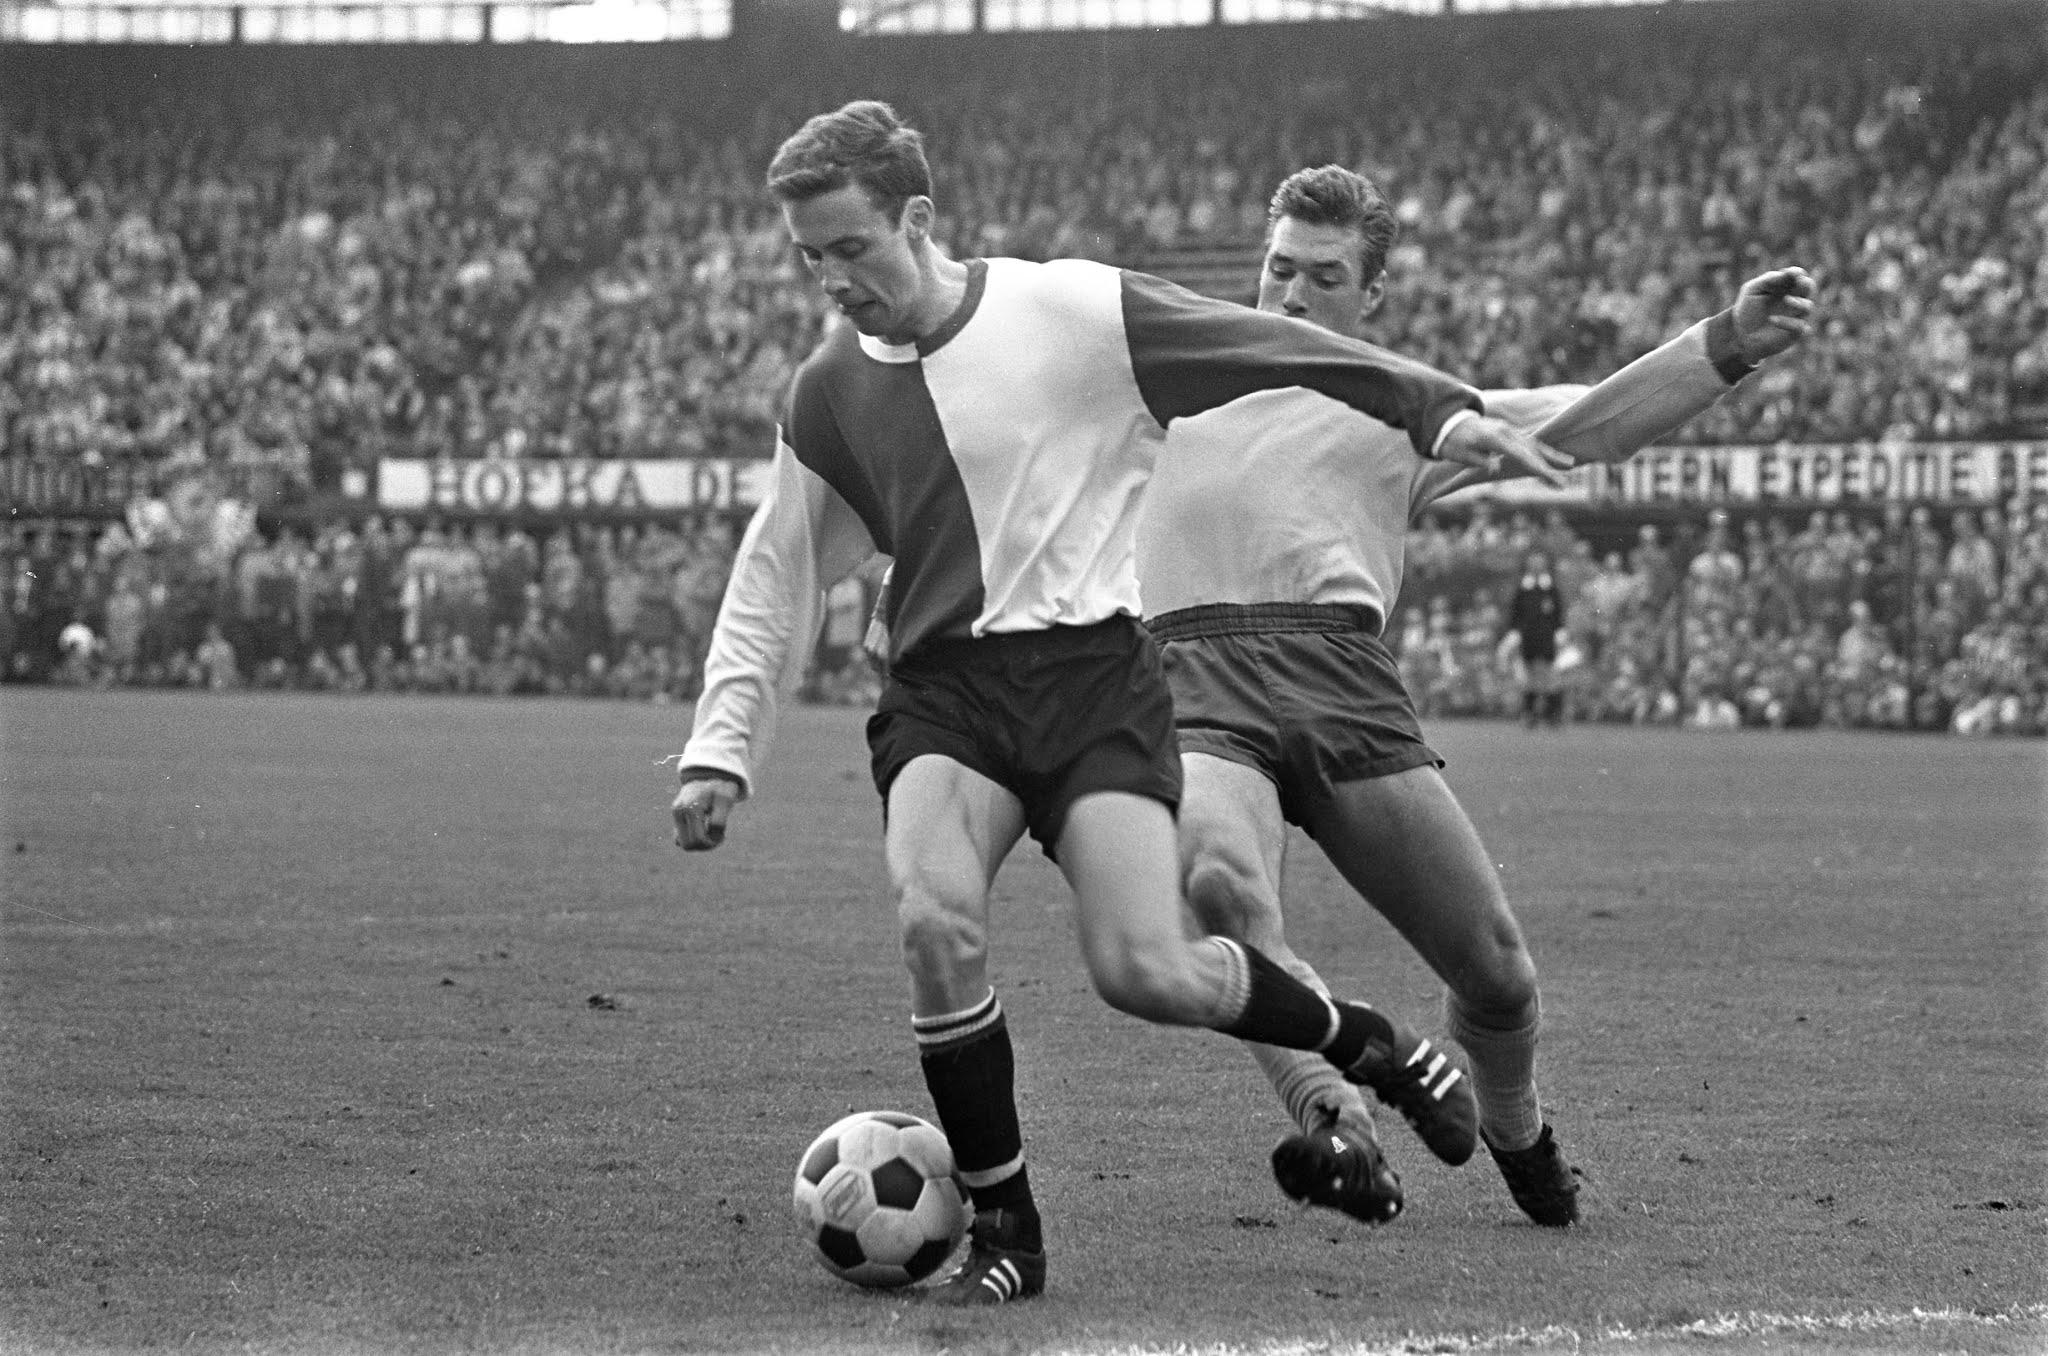 Ove Kindvall namens Feyenoord aan de bal tegen Sittardia